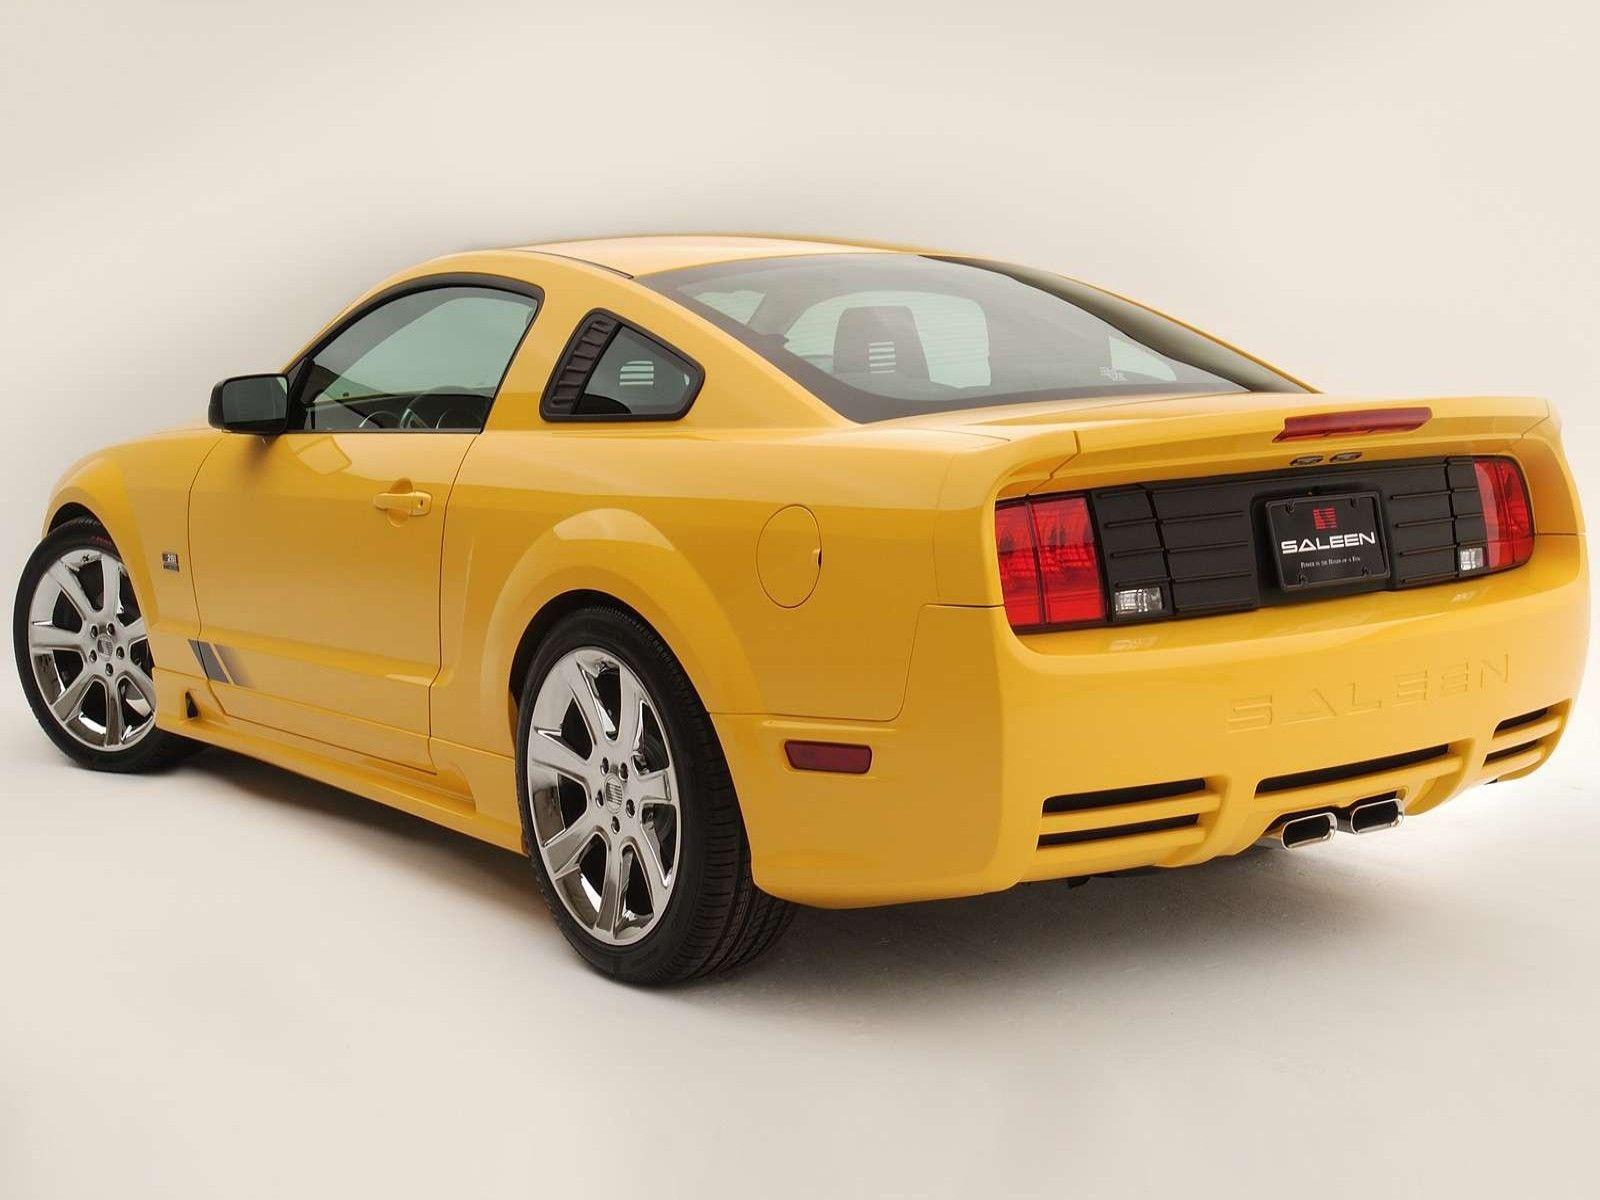 2005 Saleen S281 Ford Mustang Saleen Mustang Mustang